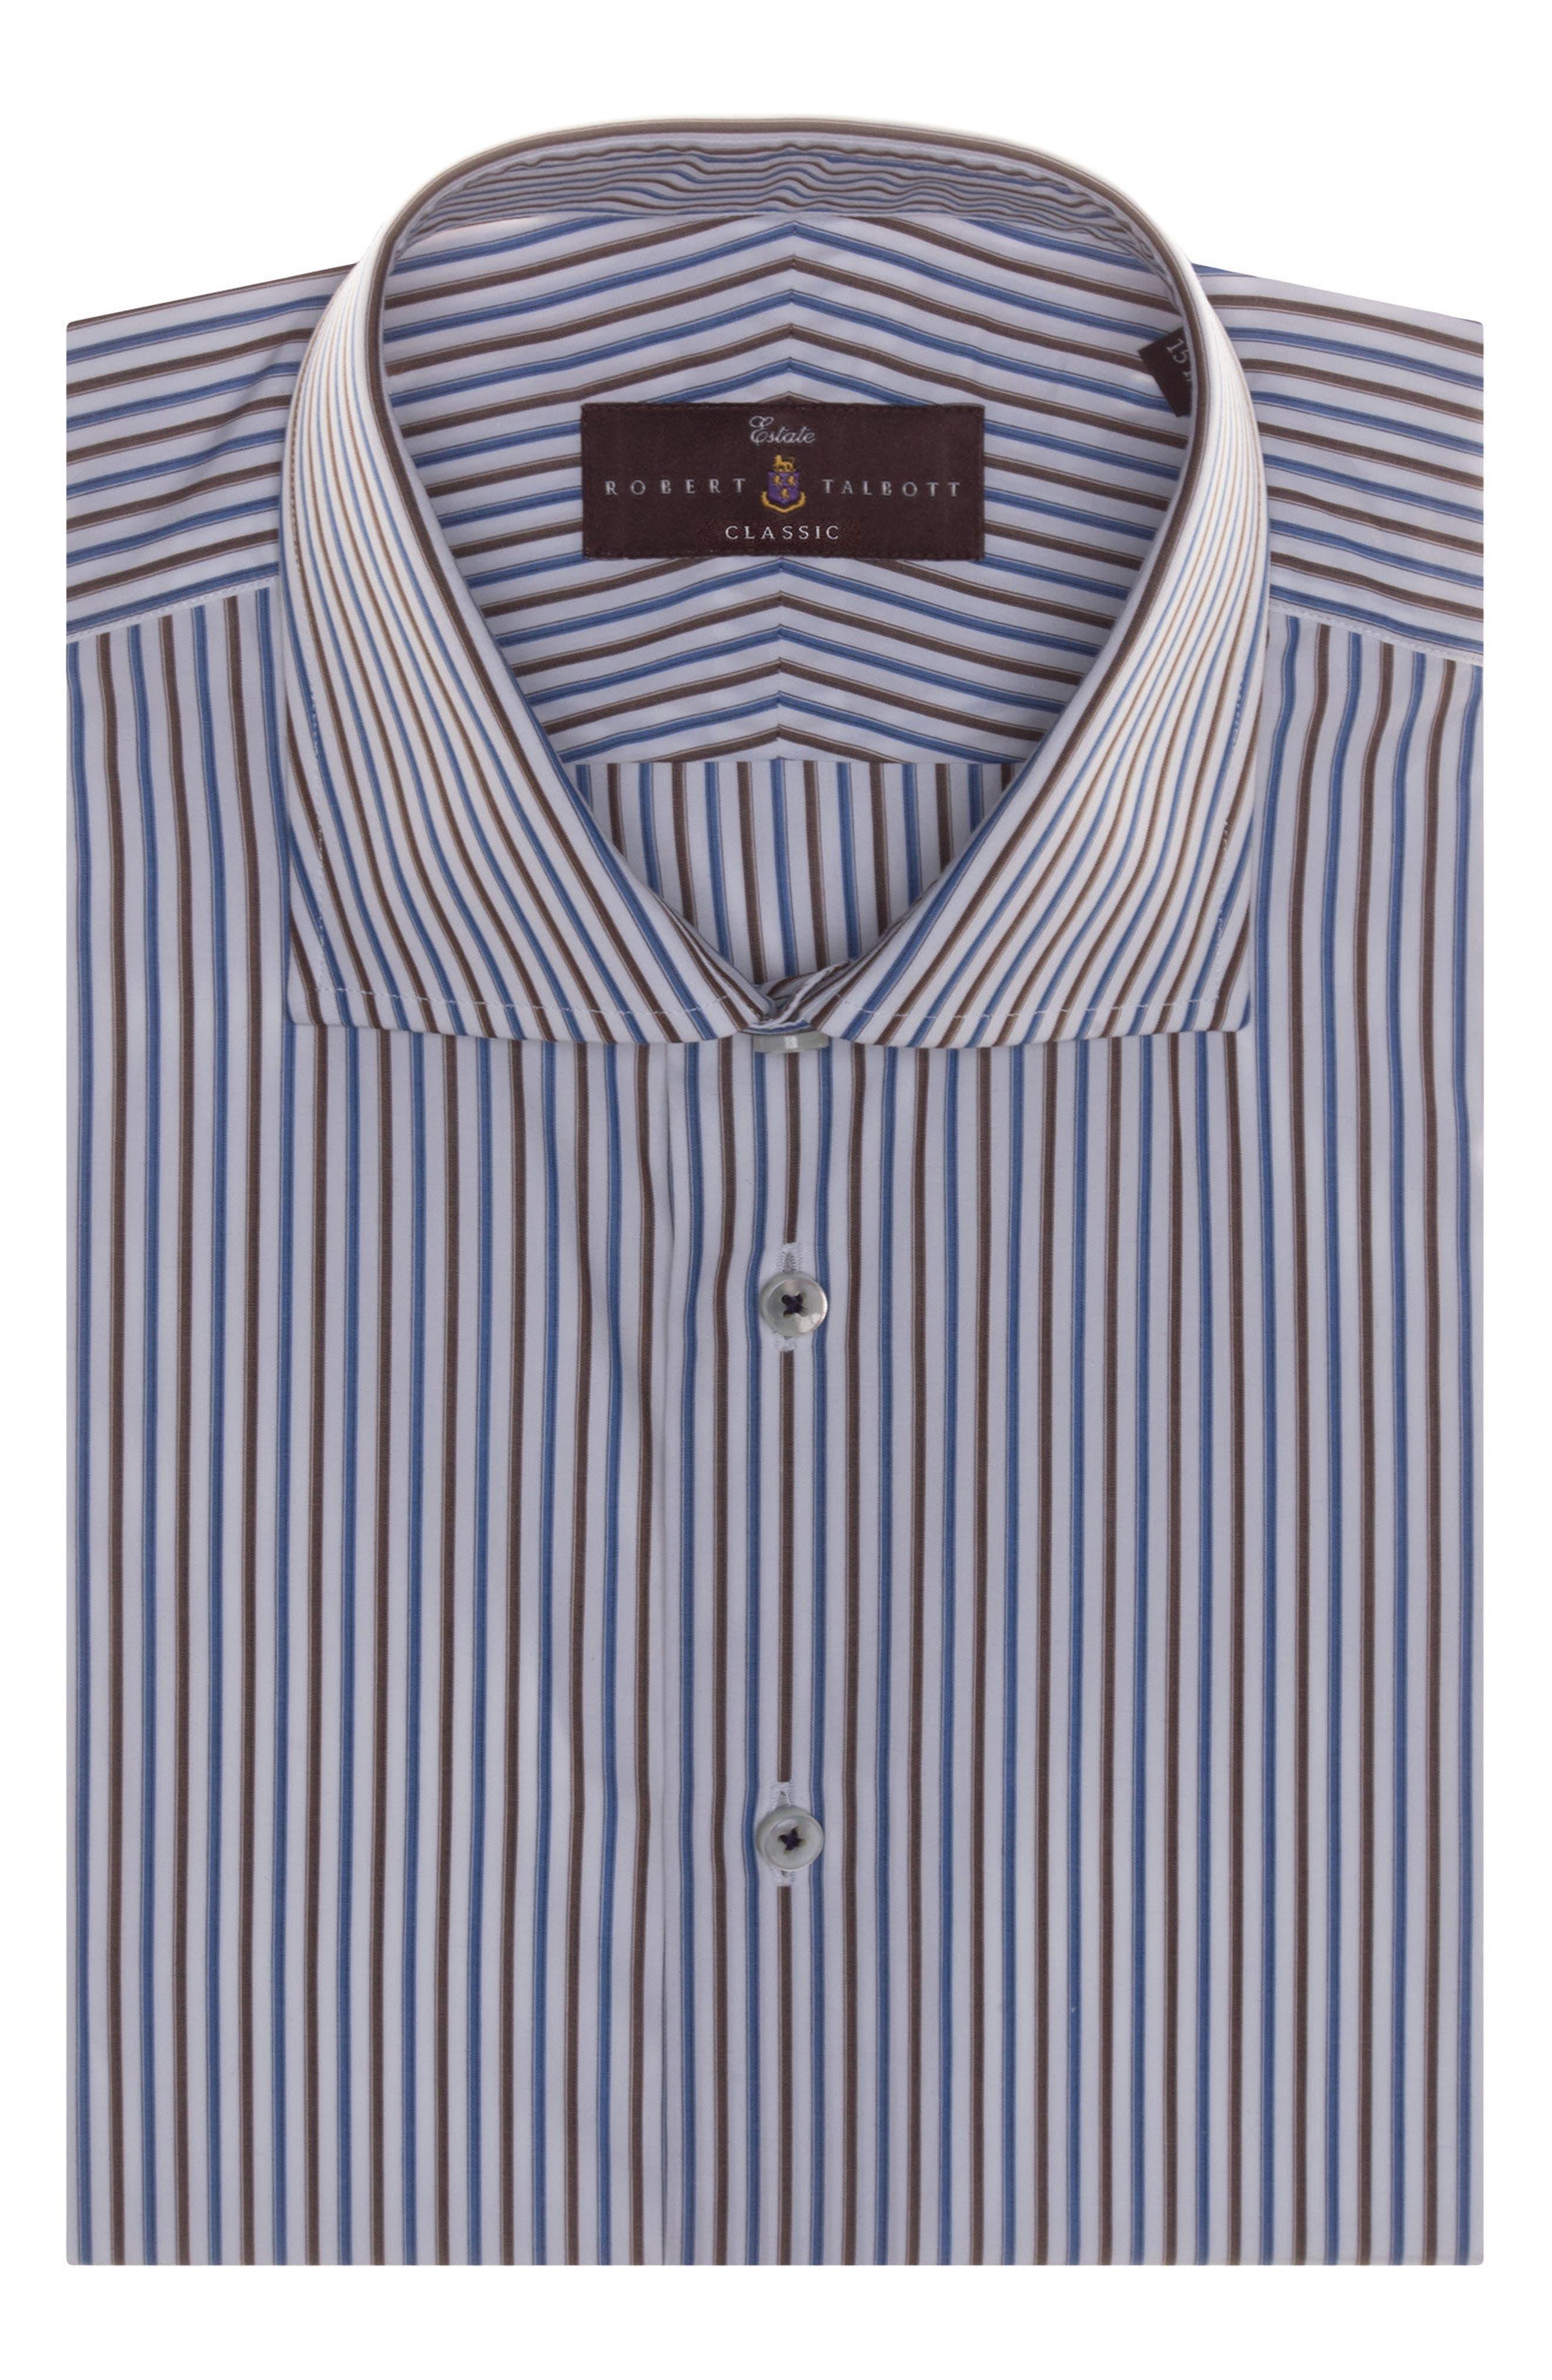 Alternate Image 1 Selected - Robert Talbott Tailored Fit Stripe Dress Shirt